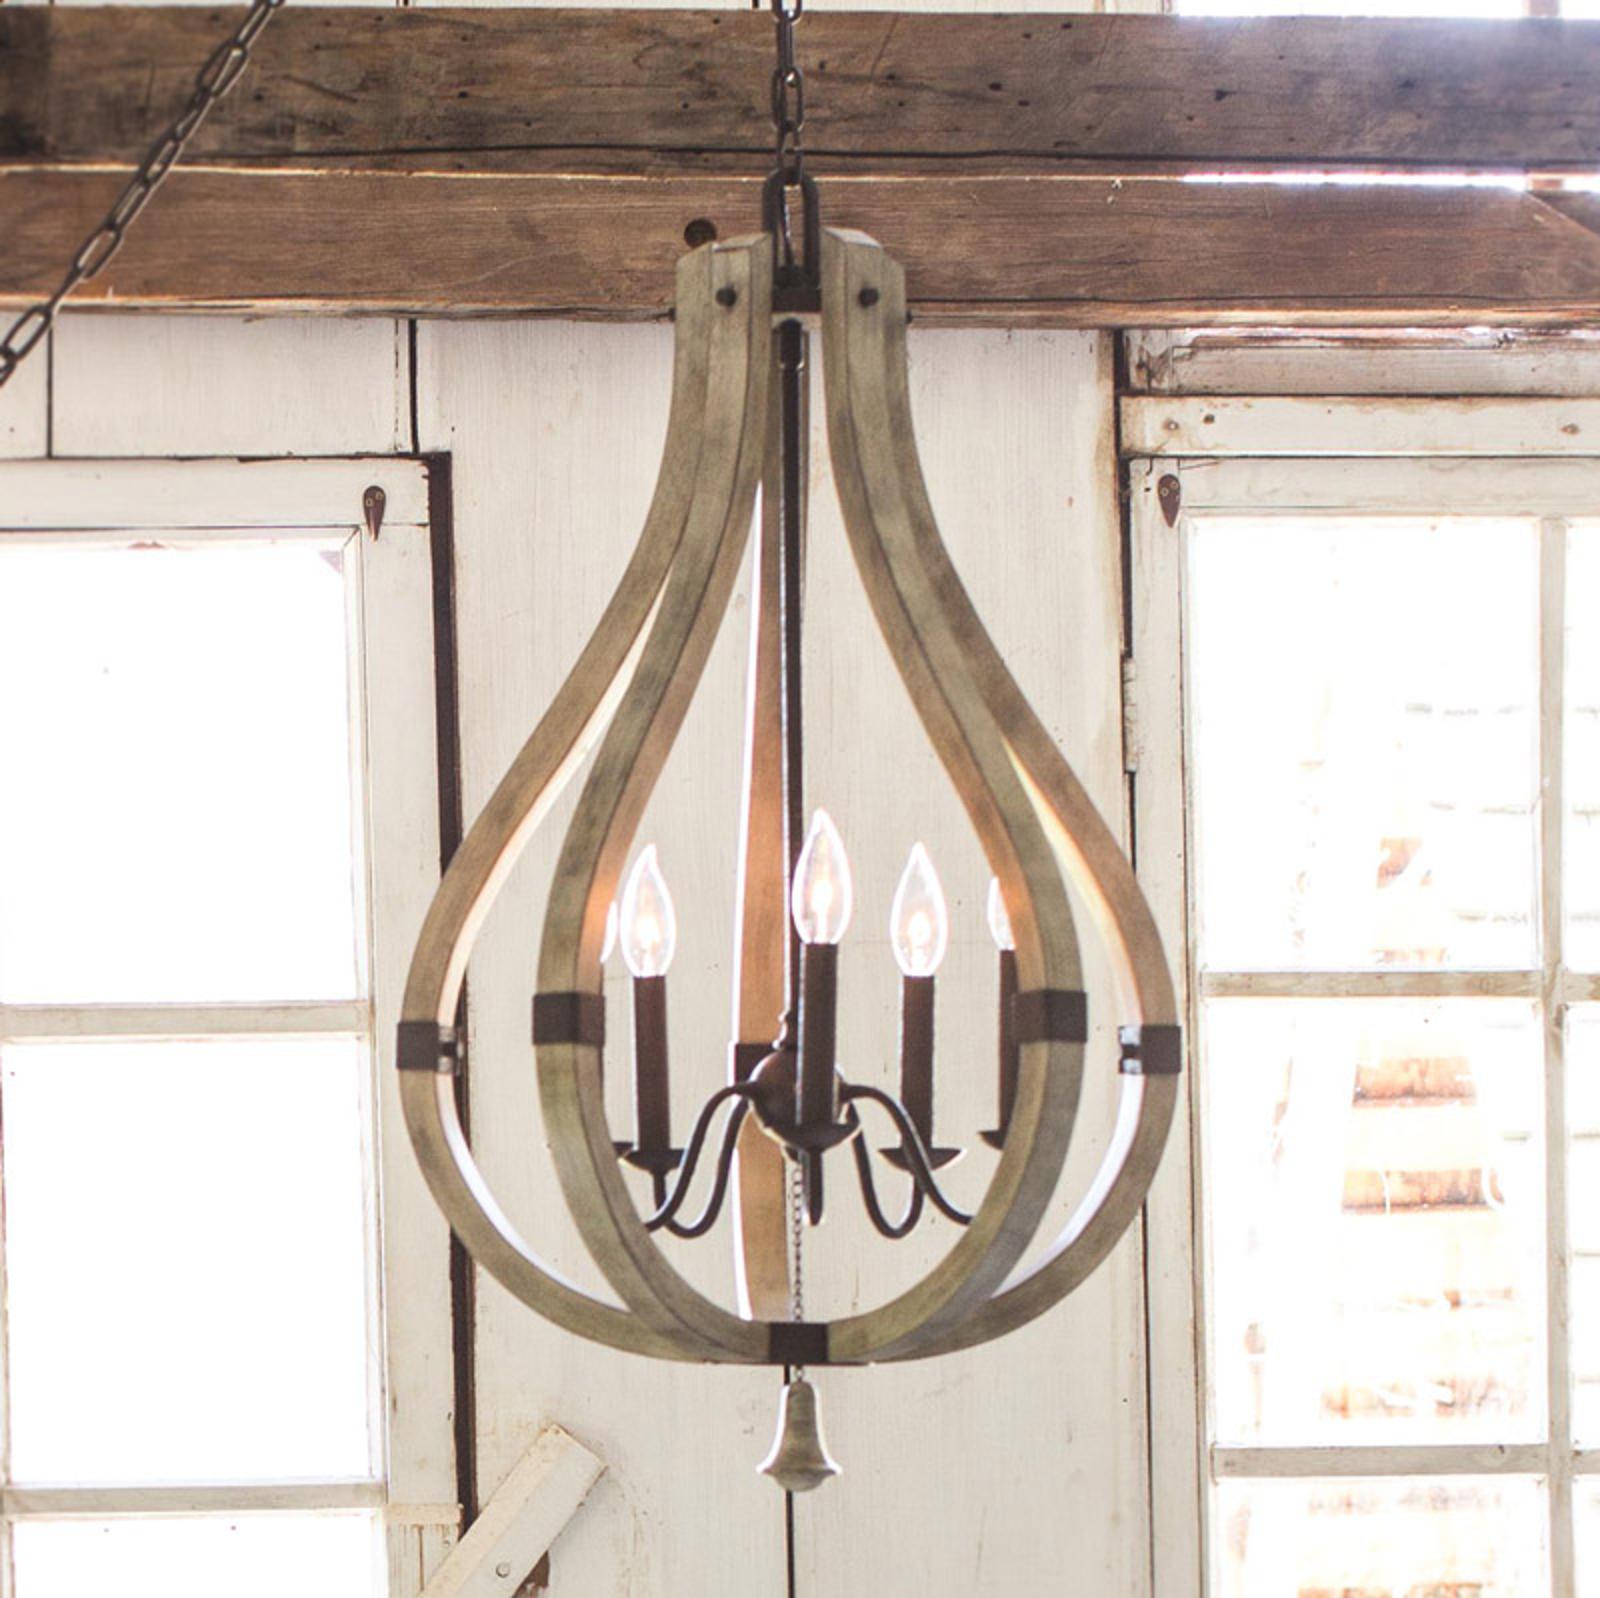 Araña de madera y acero Middlefield 5 luces